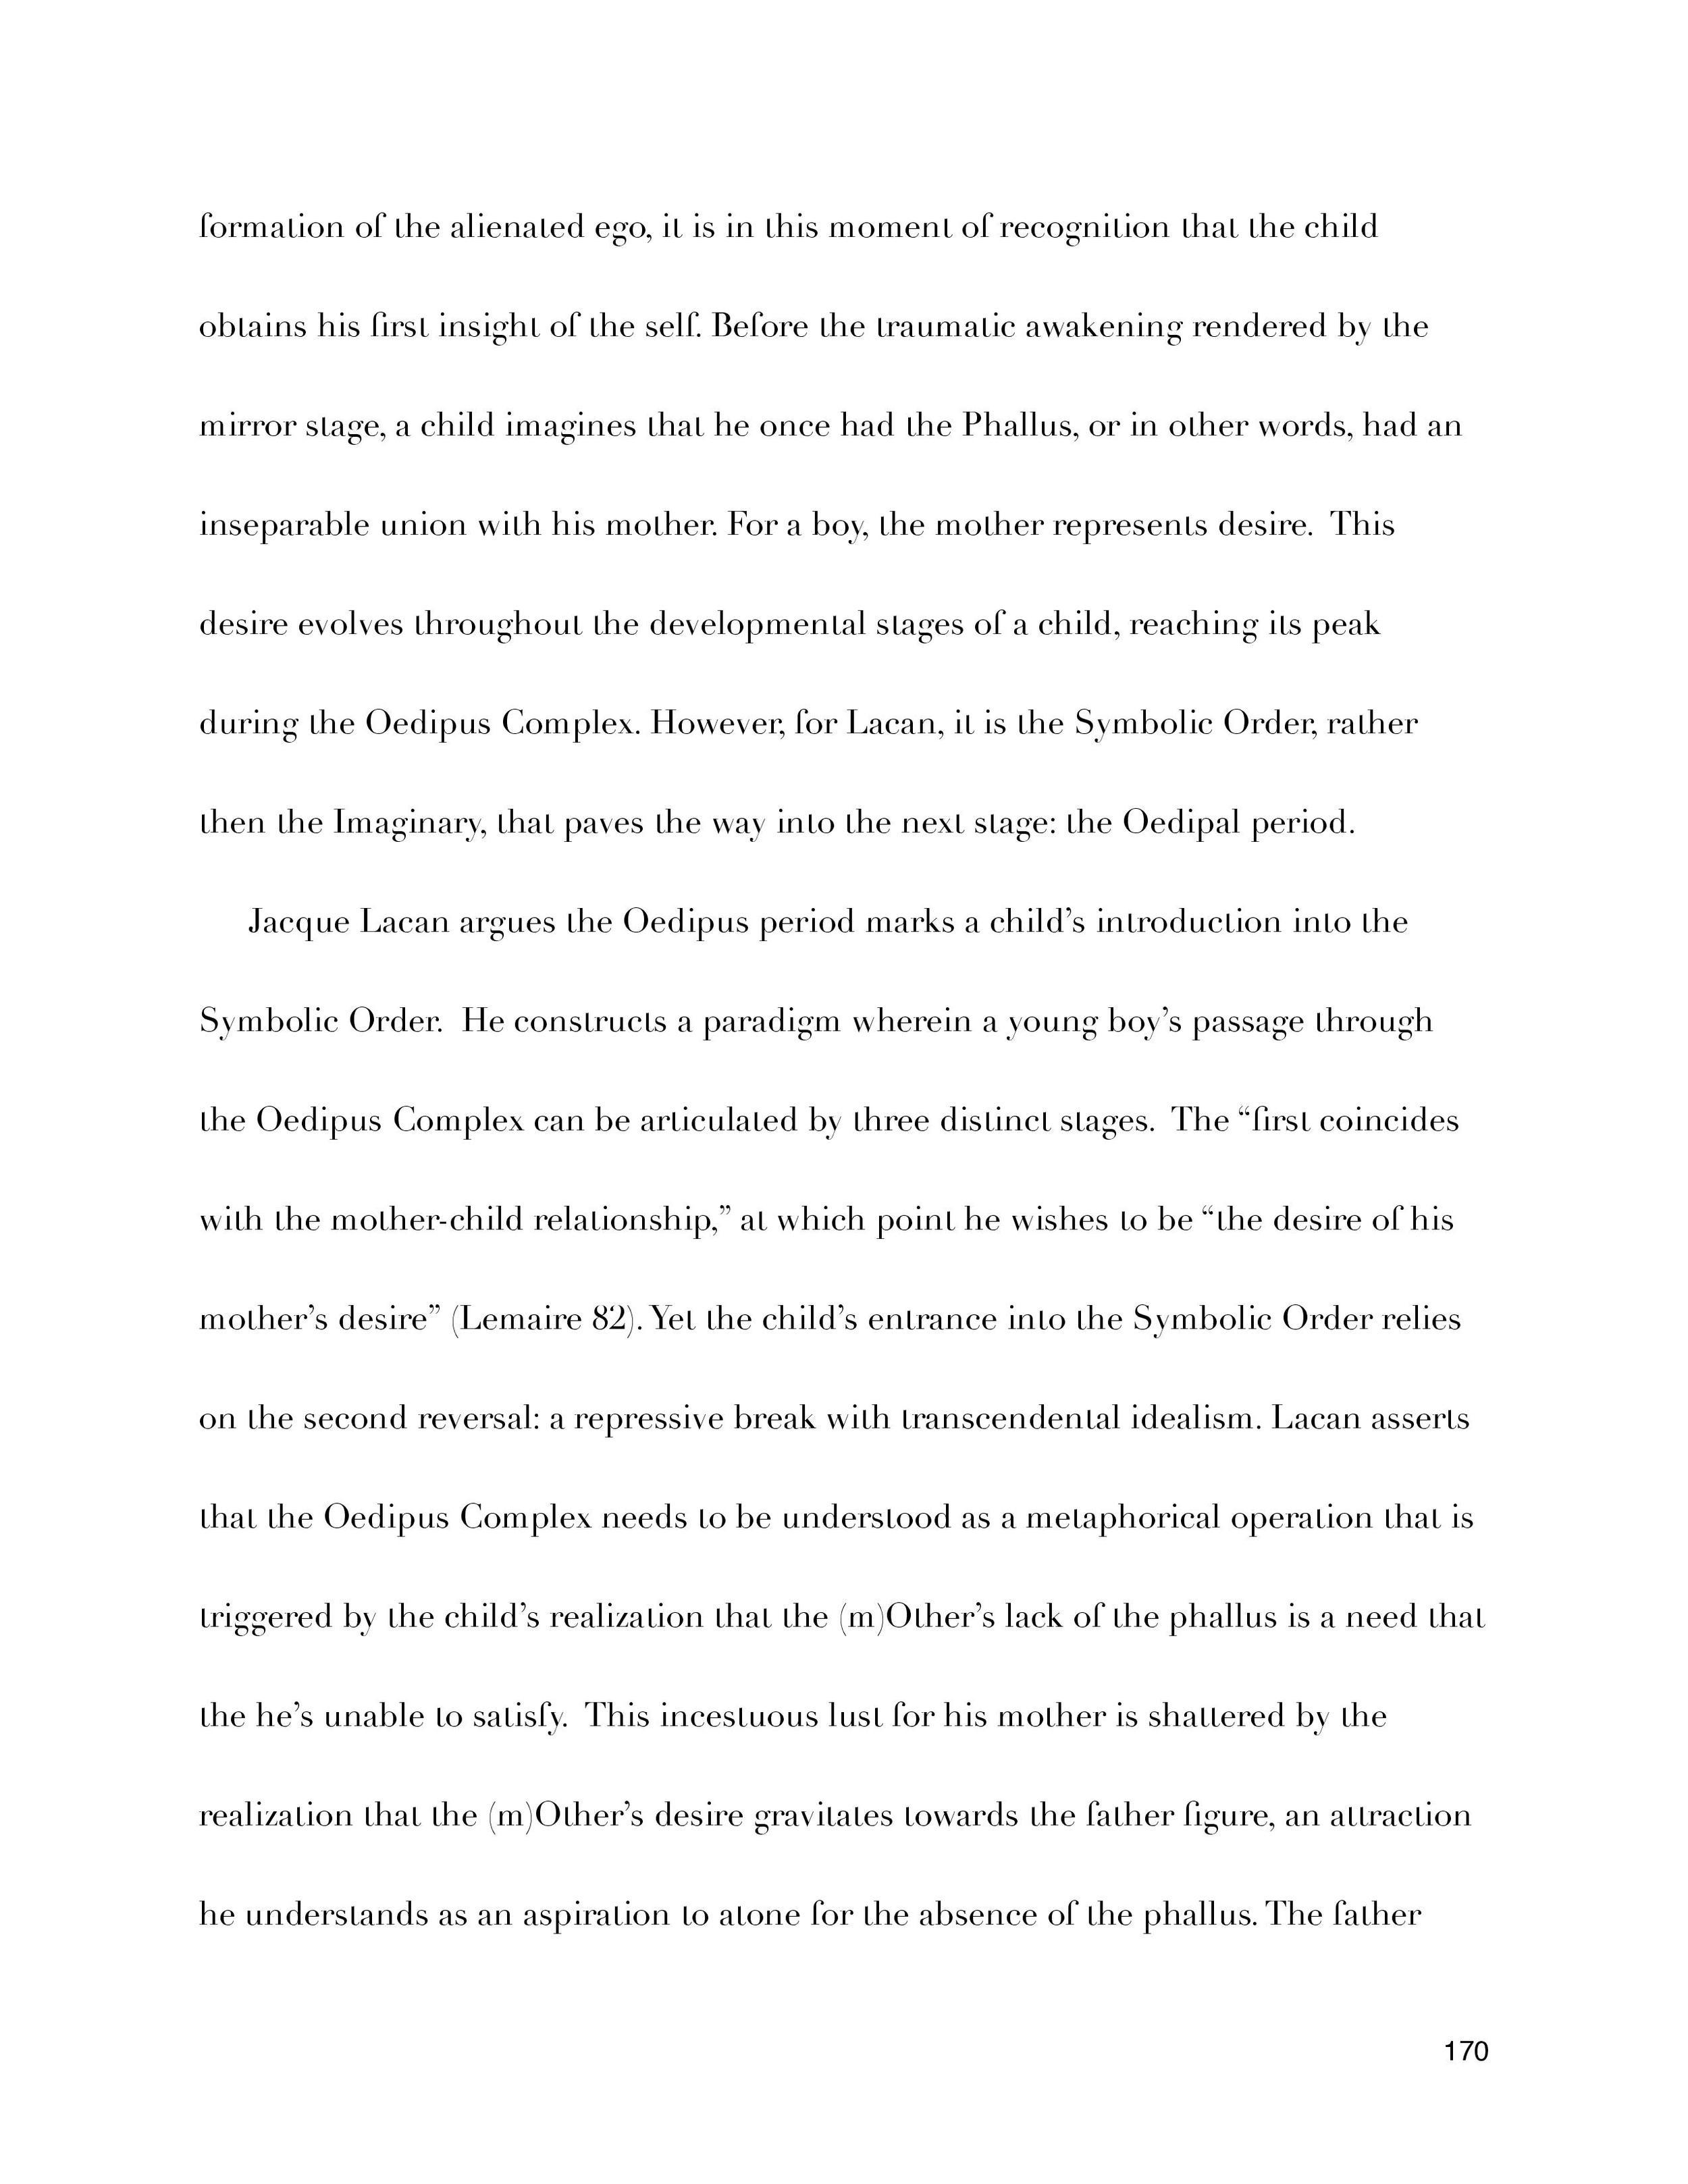 ShatteredGlass-page-171.jpg